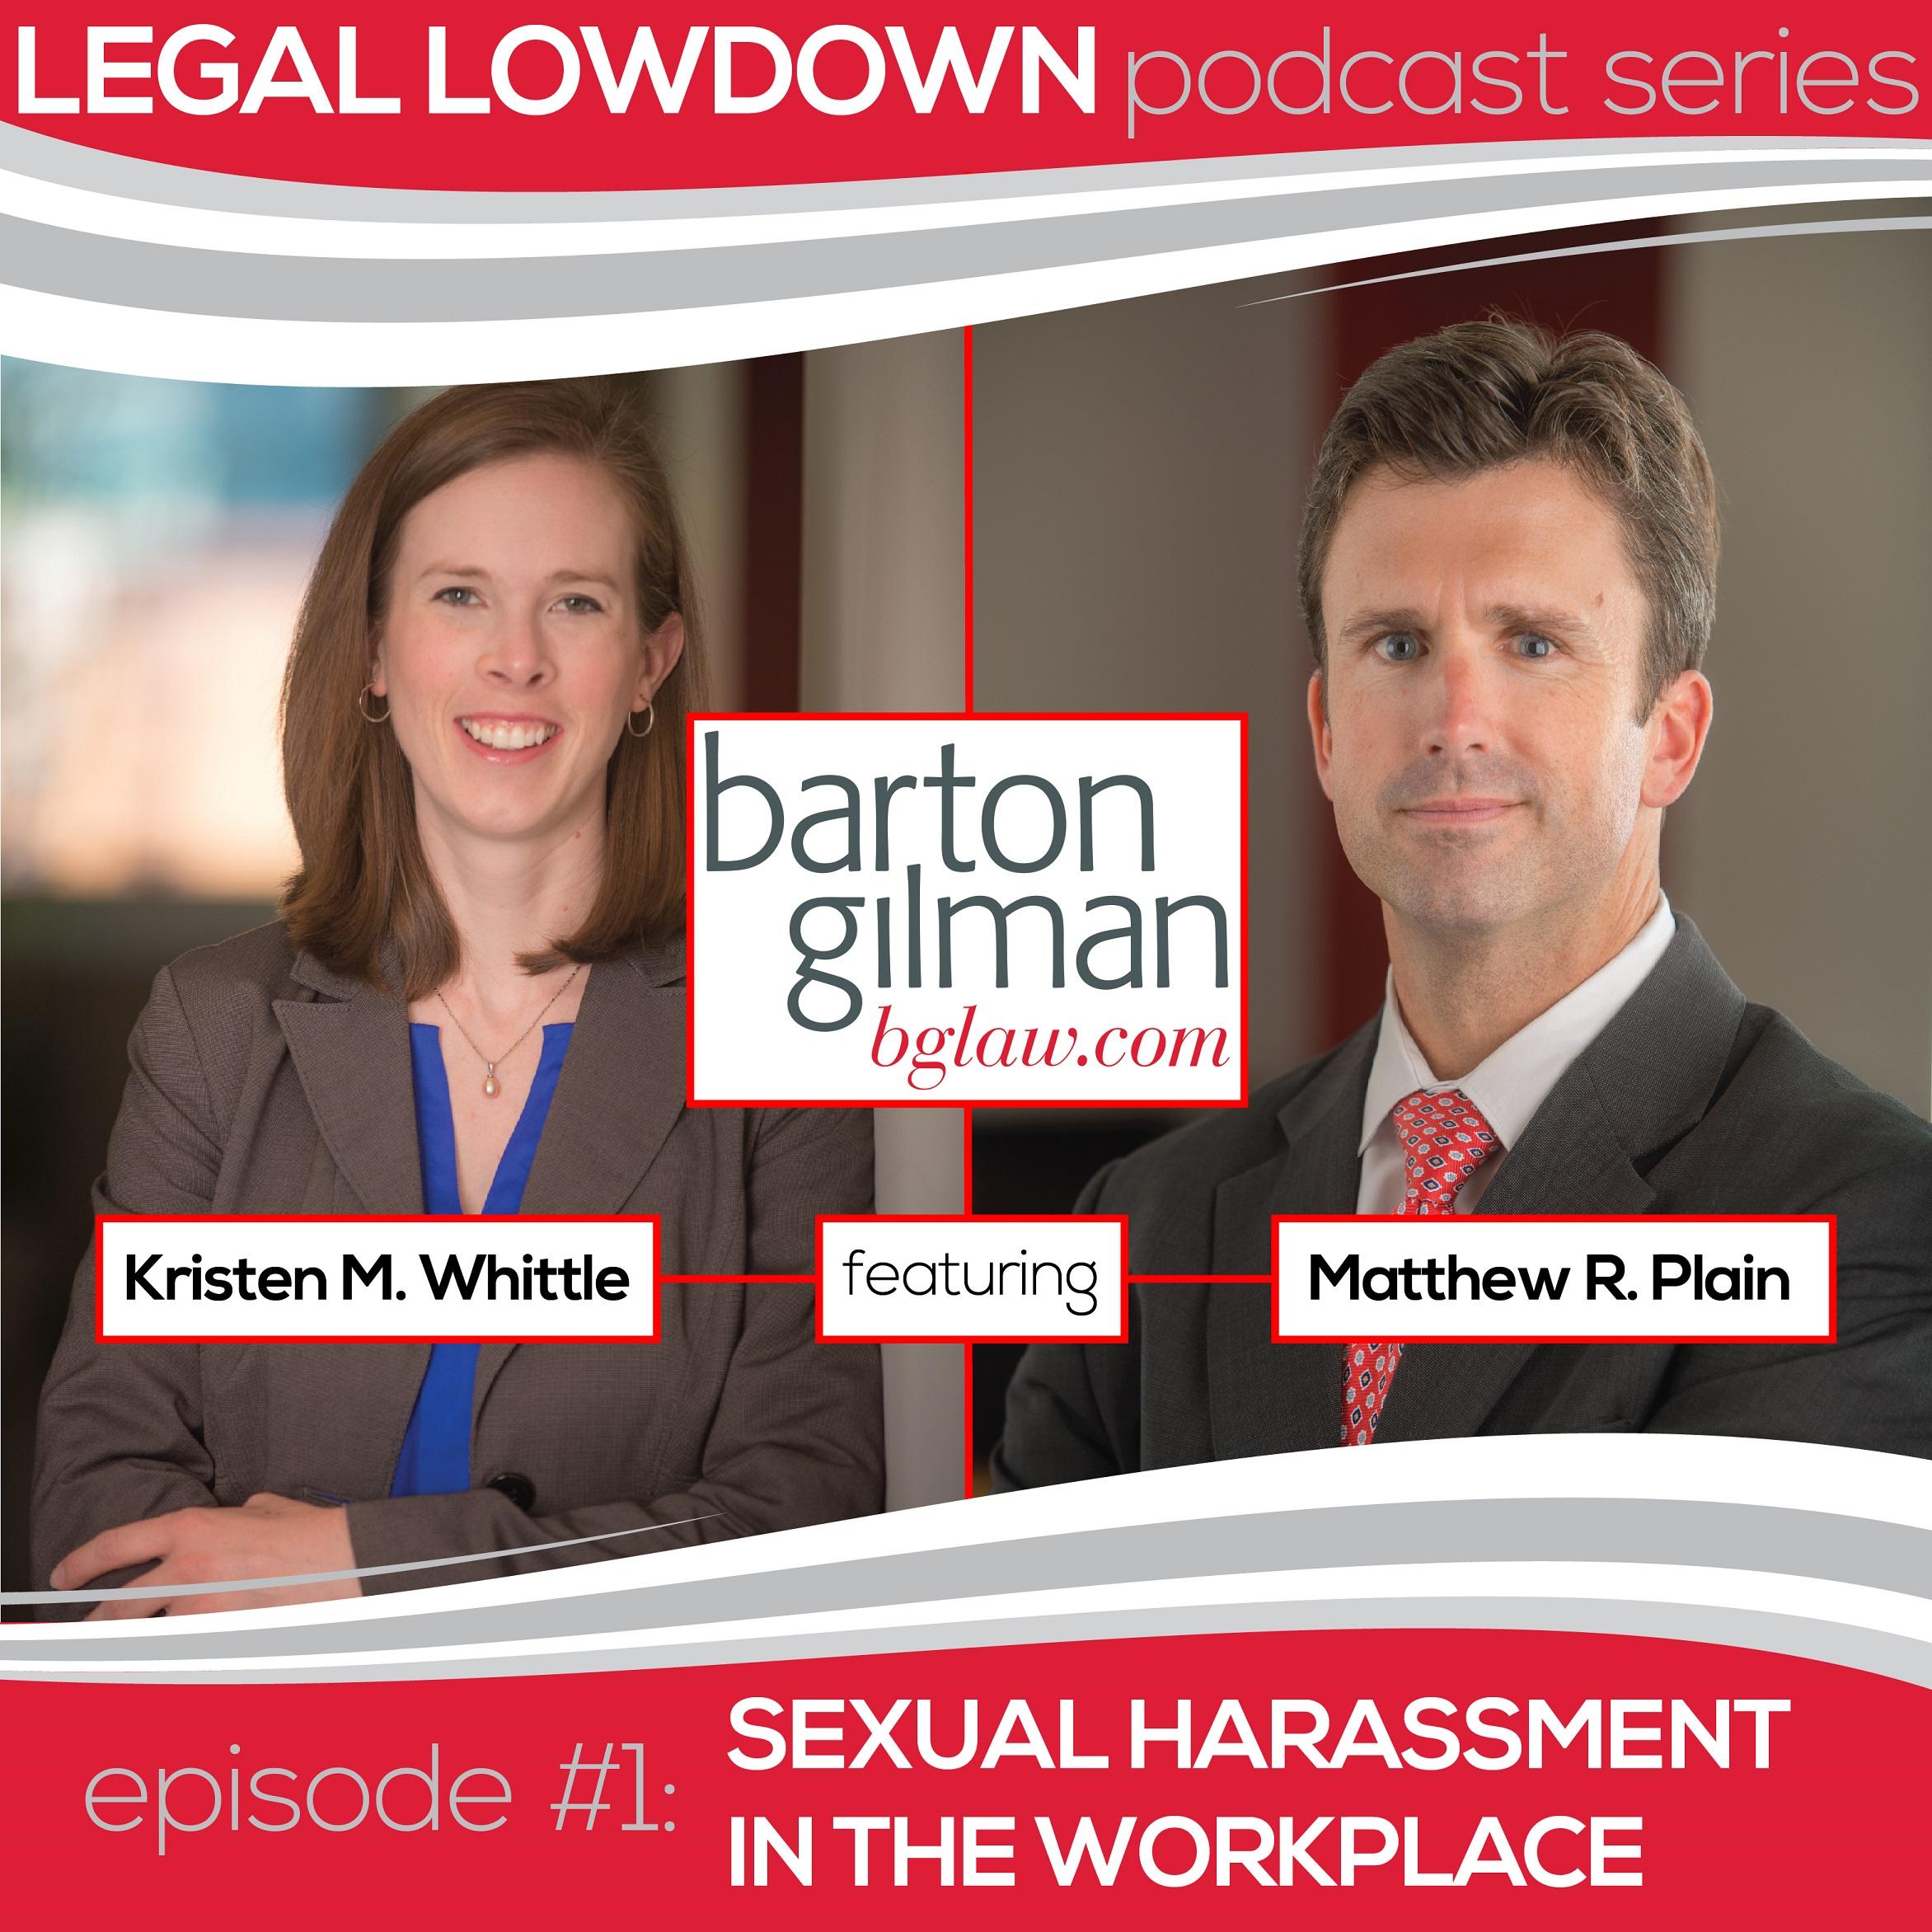 Legal lowdown podcast